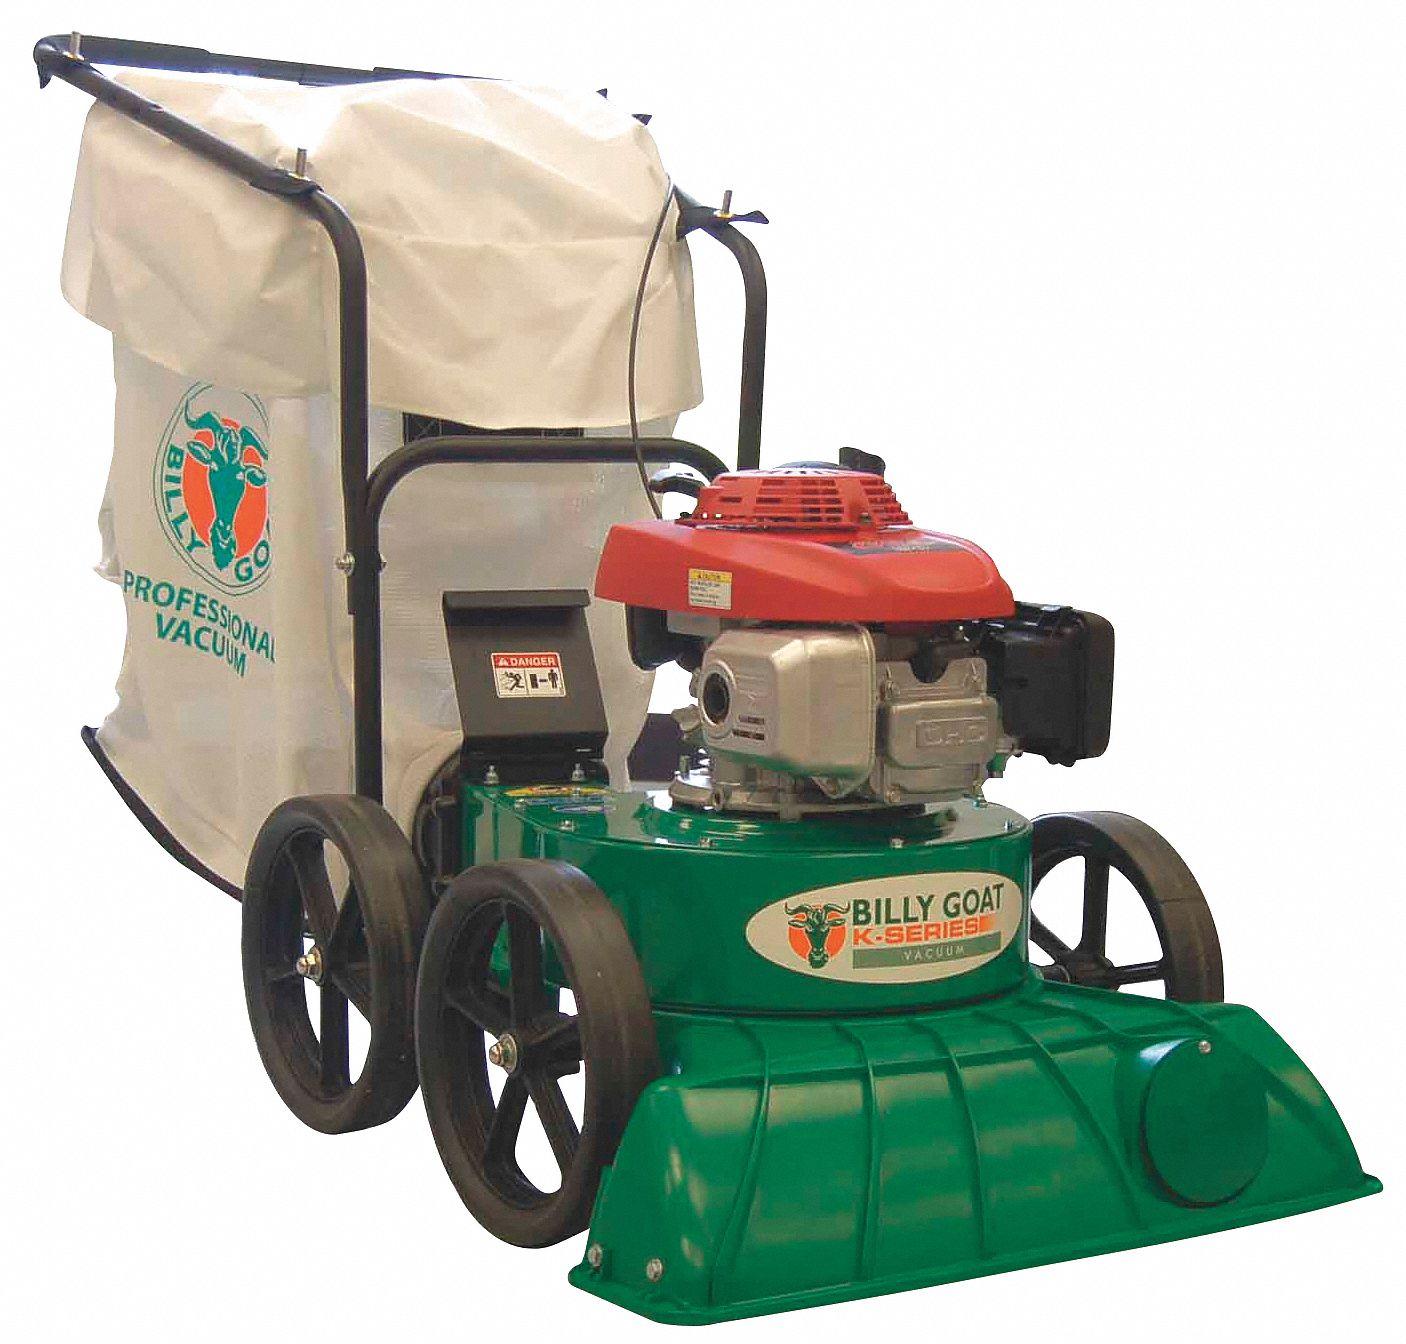 Billy Goat Outdoor Litter Vacuum Drive Type Push Bag Volume 40 Gal Cleaning Path 27 5nlg6 Kv650h Grainger